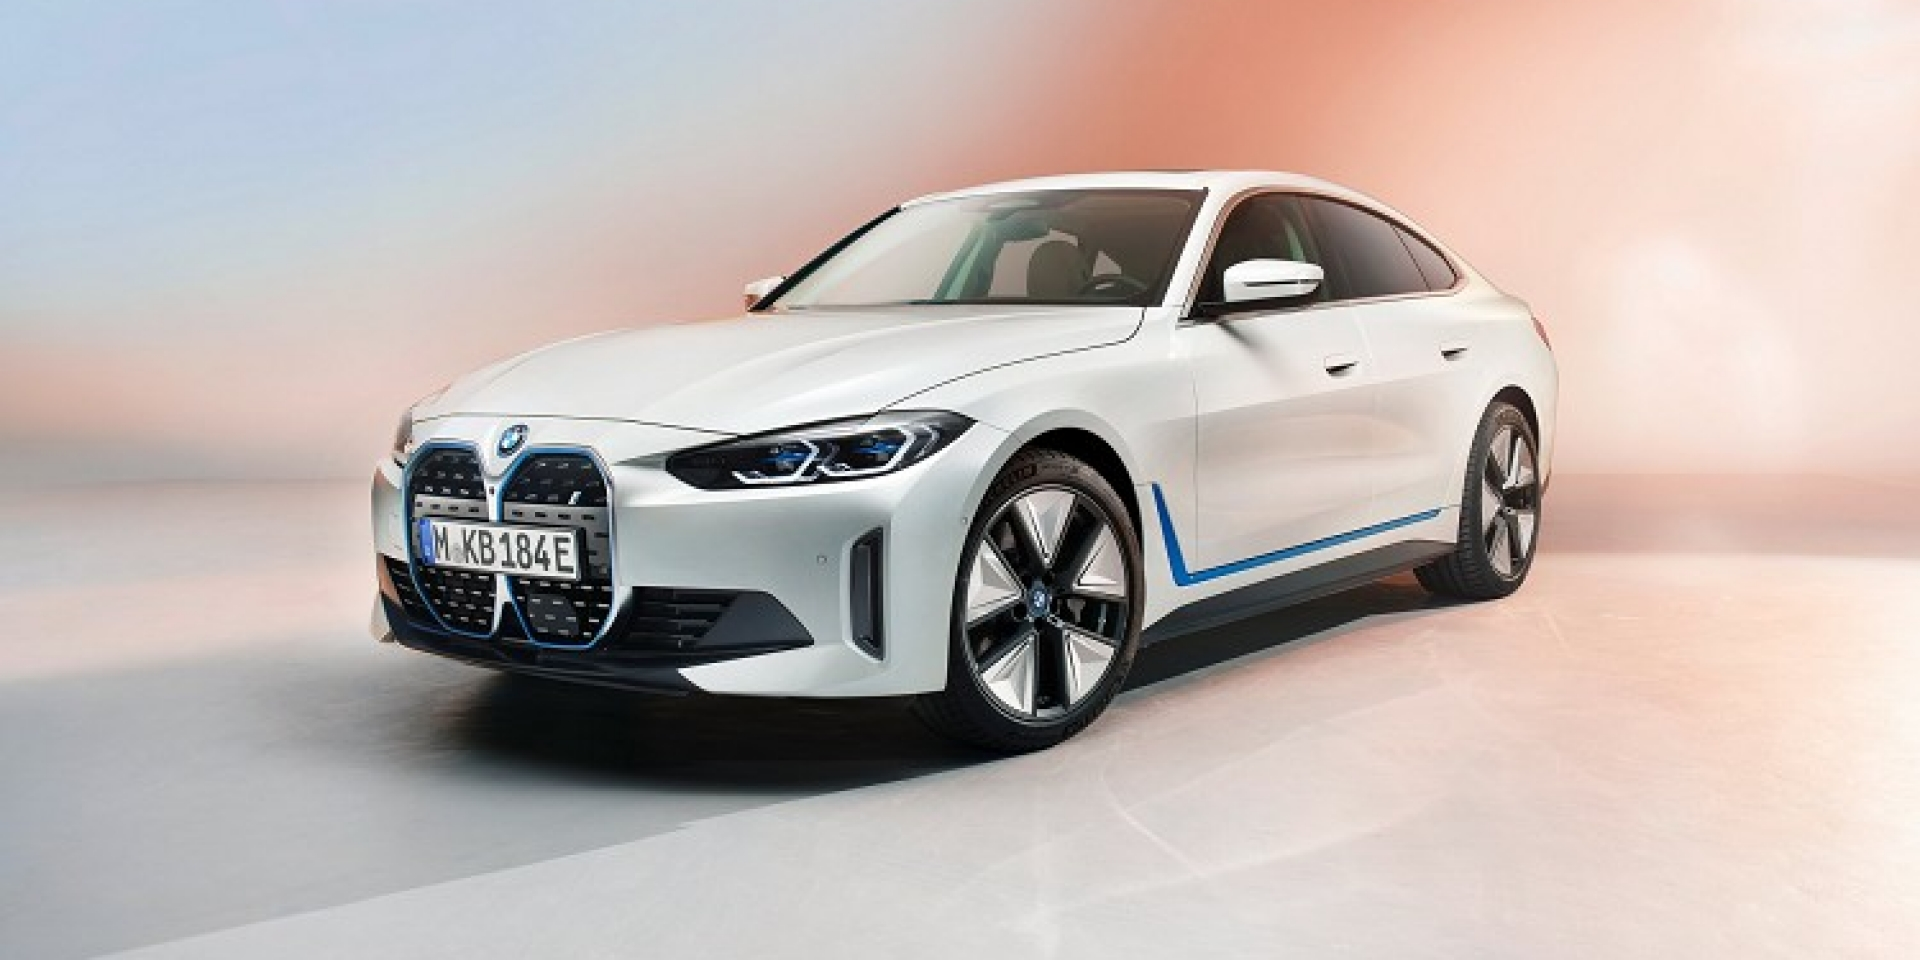 BMW 推出四門轎跑電動車i4,有望今年正式量產